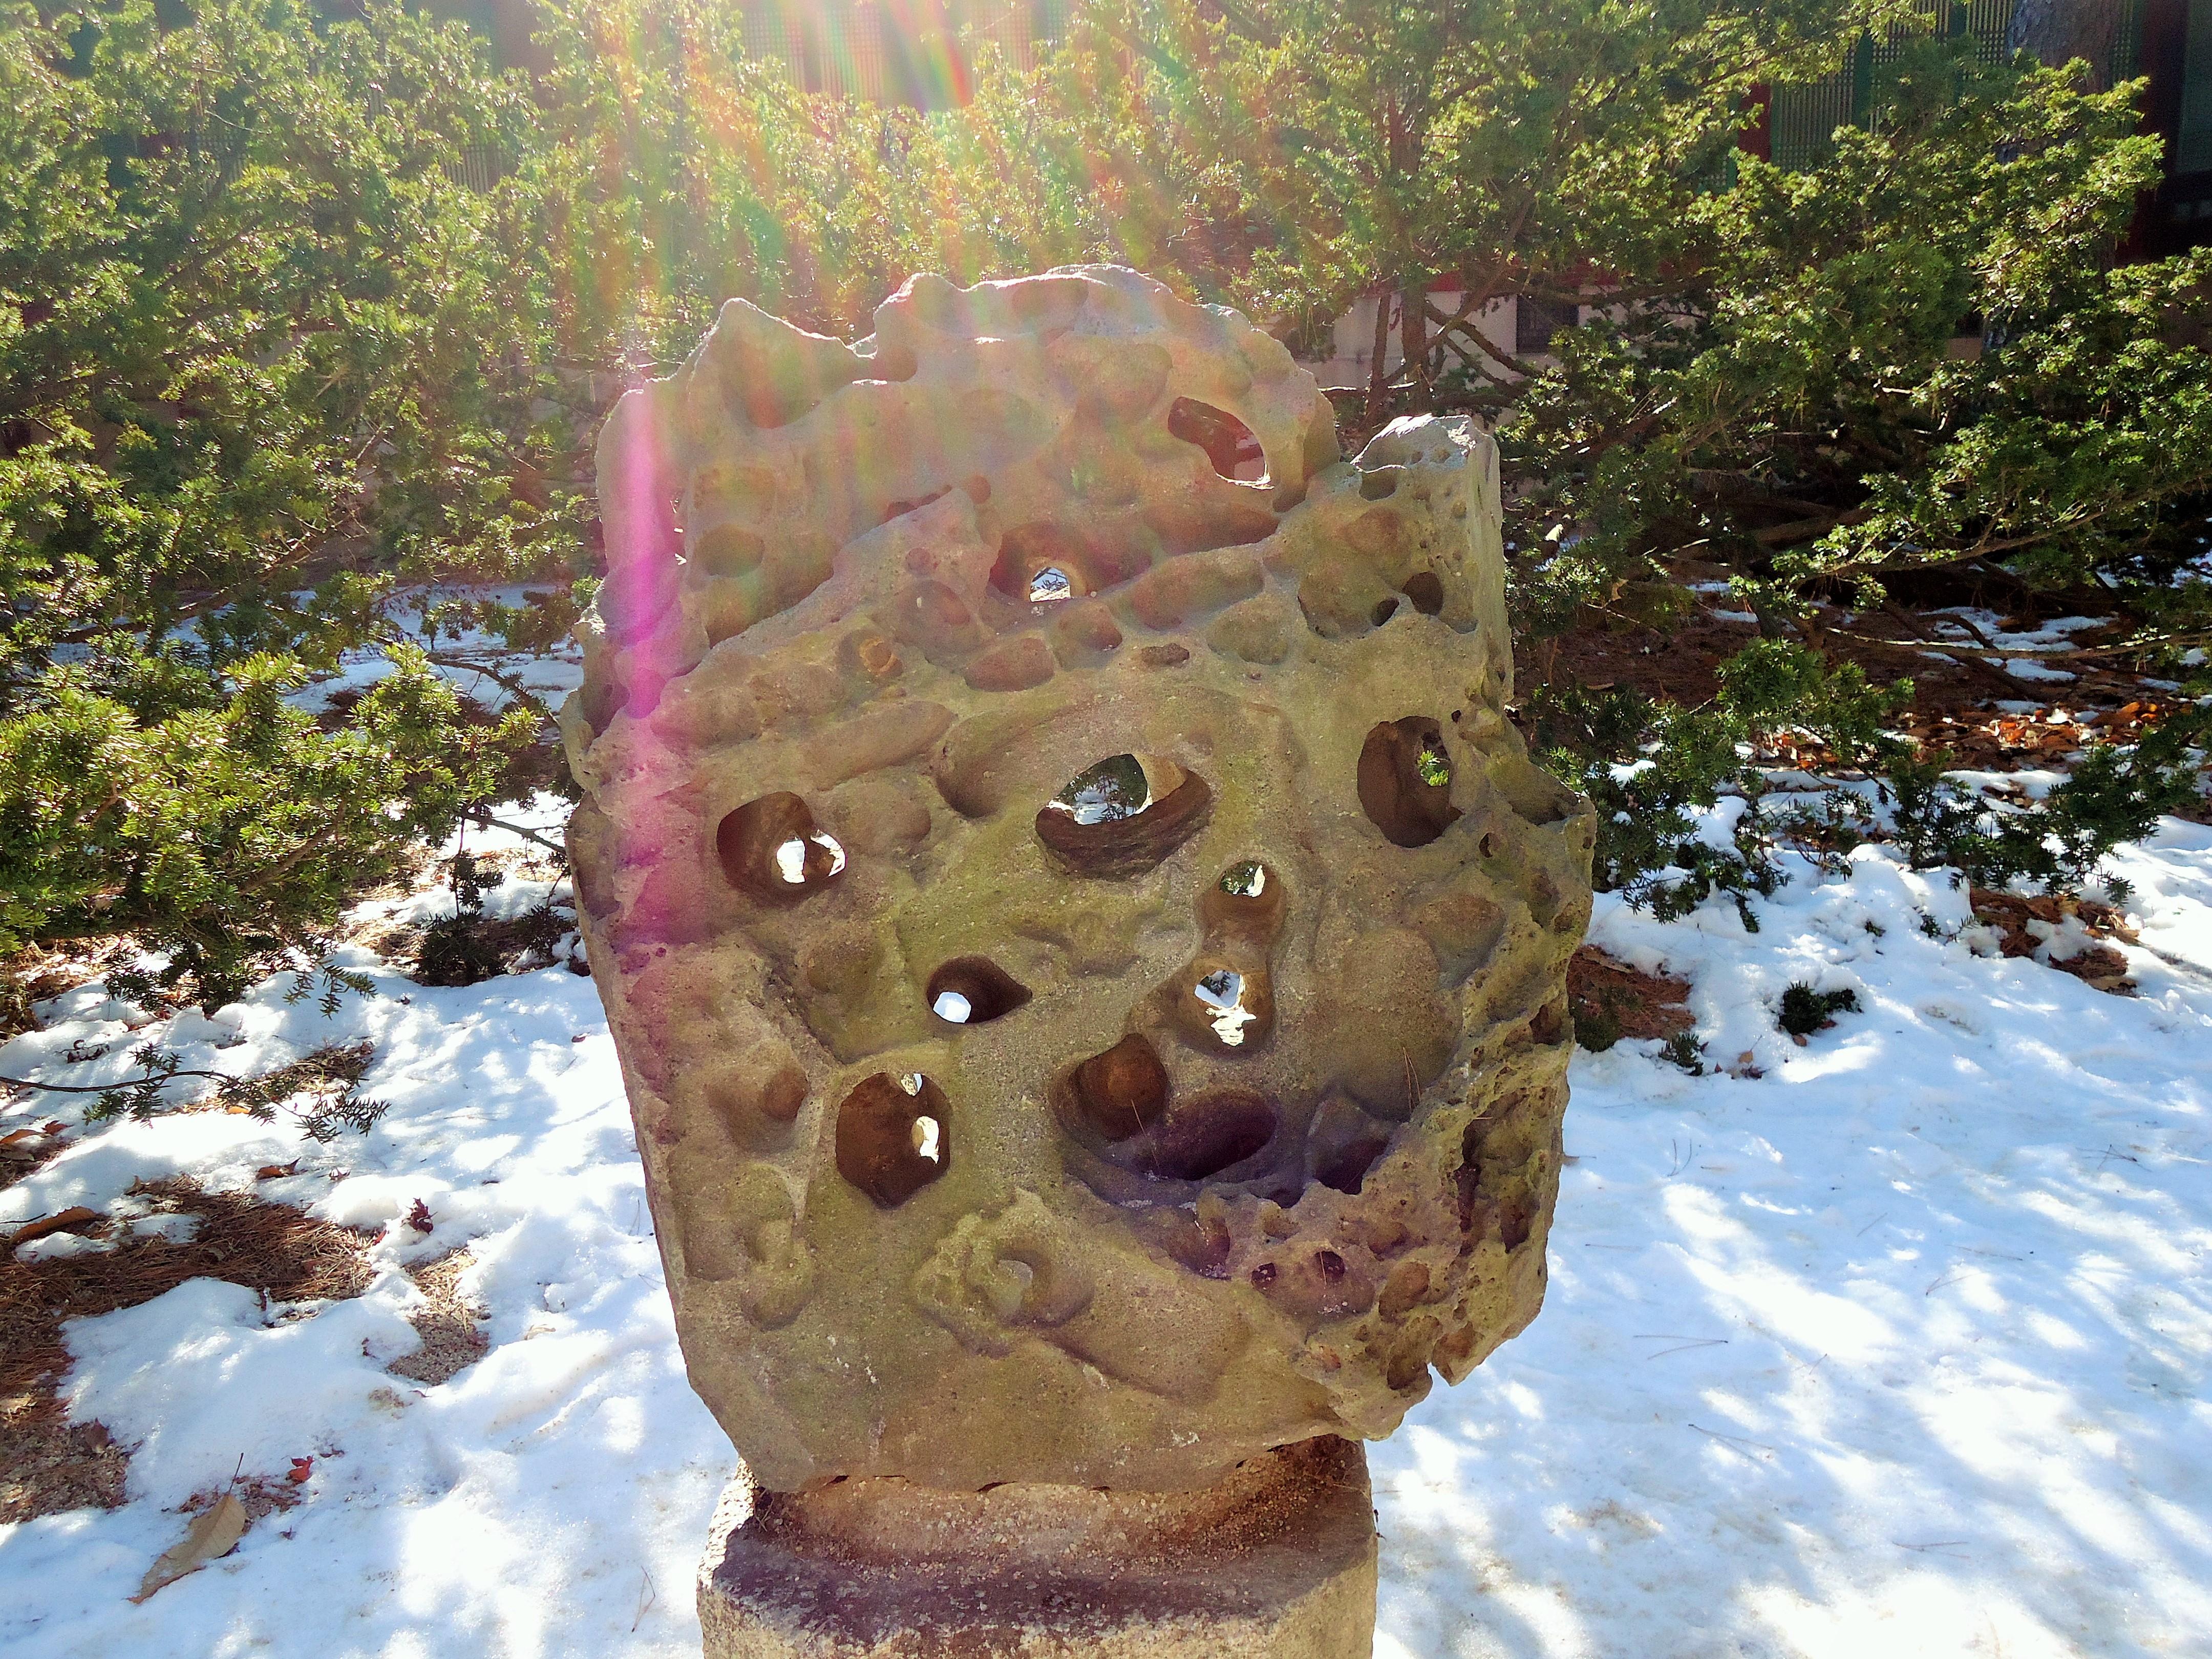 А камень с дыркай испалняет жилания